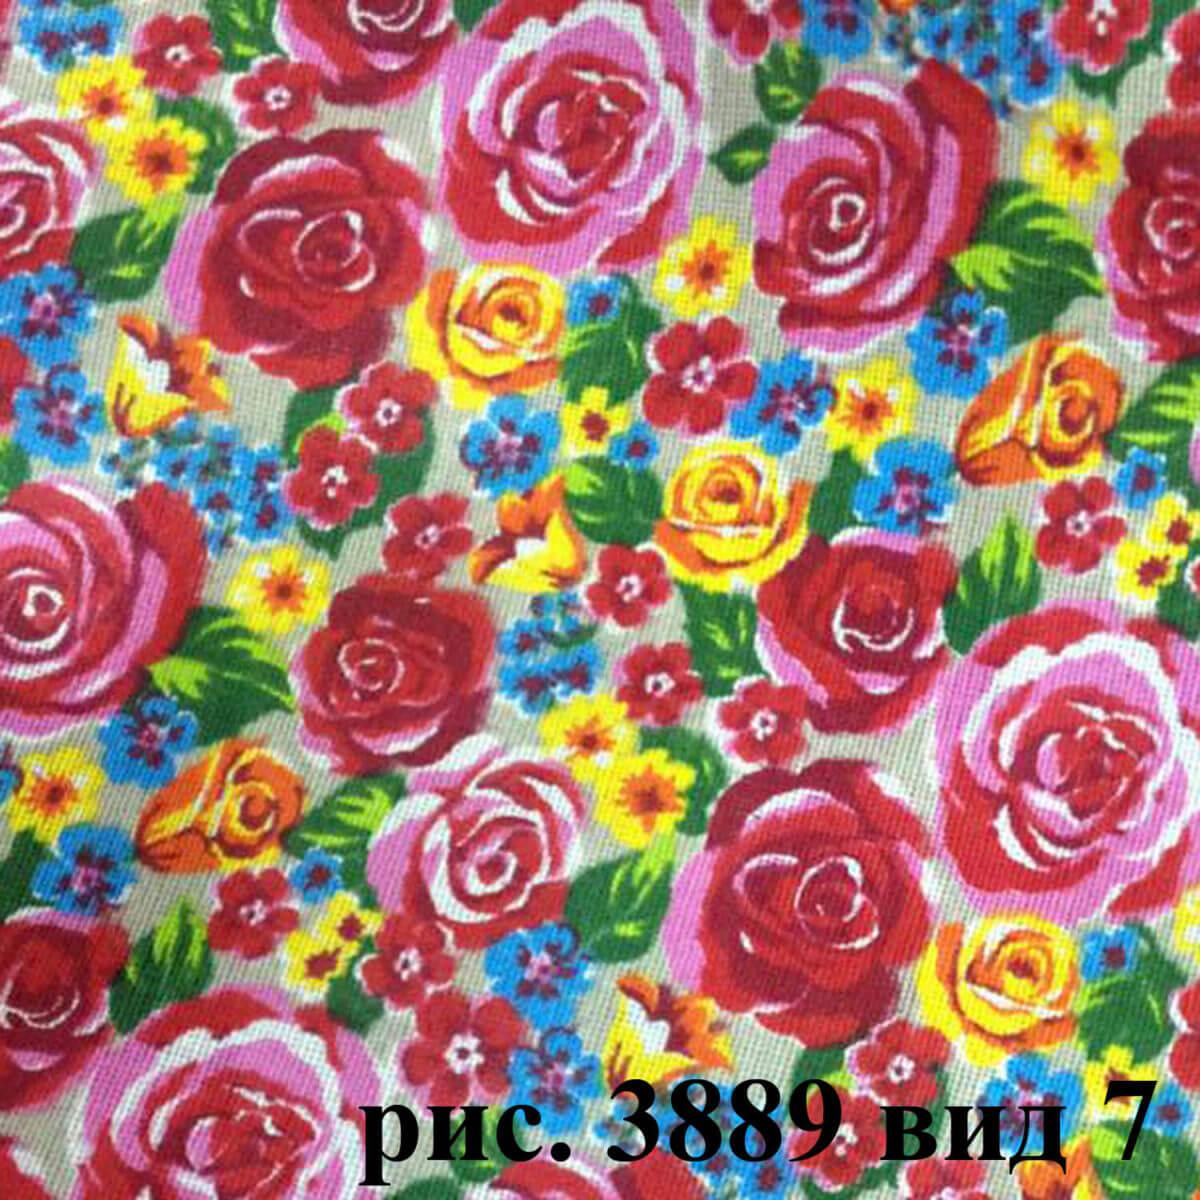 Фото 14 - Плательная ткань бязь 150 см (3889/7) Под заказ.